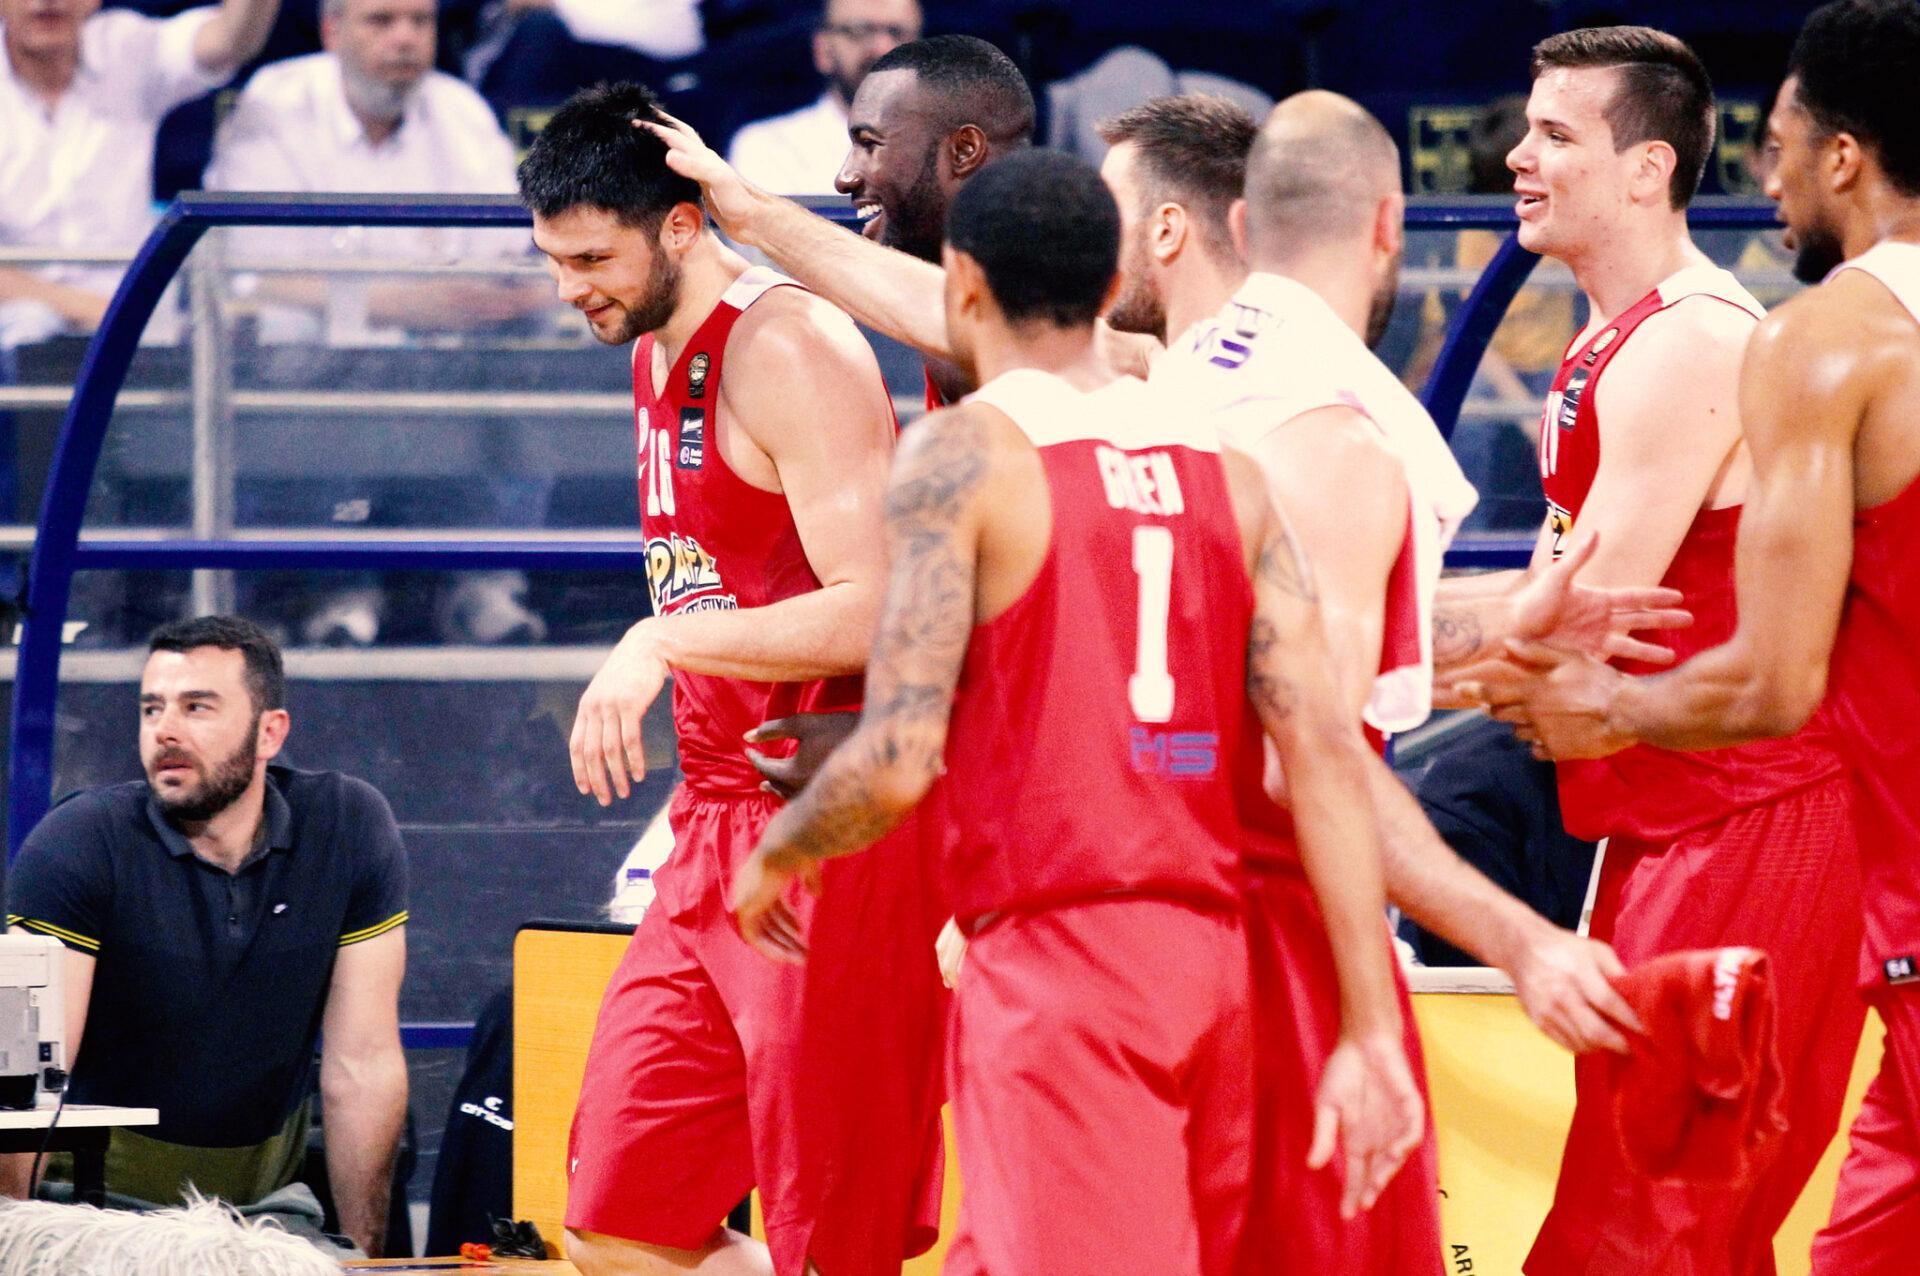 Deja-Vu i Istanbul, da Olympiacos endnu en gang satte en stopper for CSKA Moscow